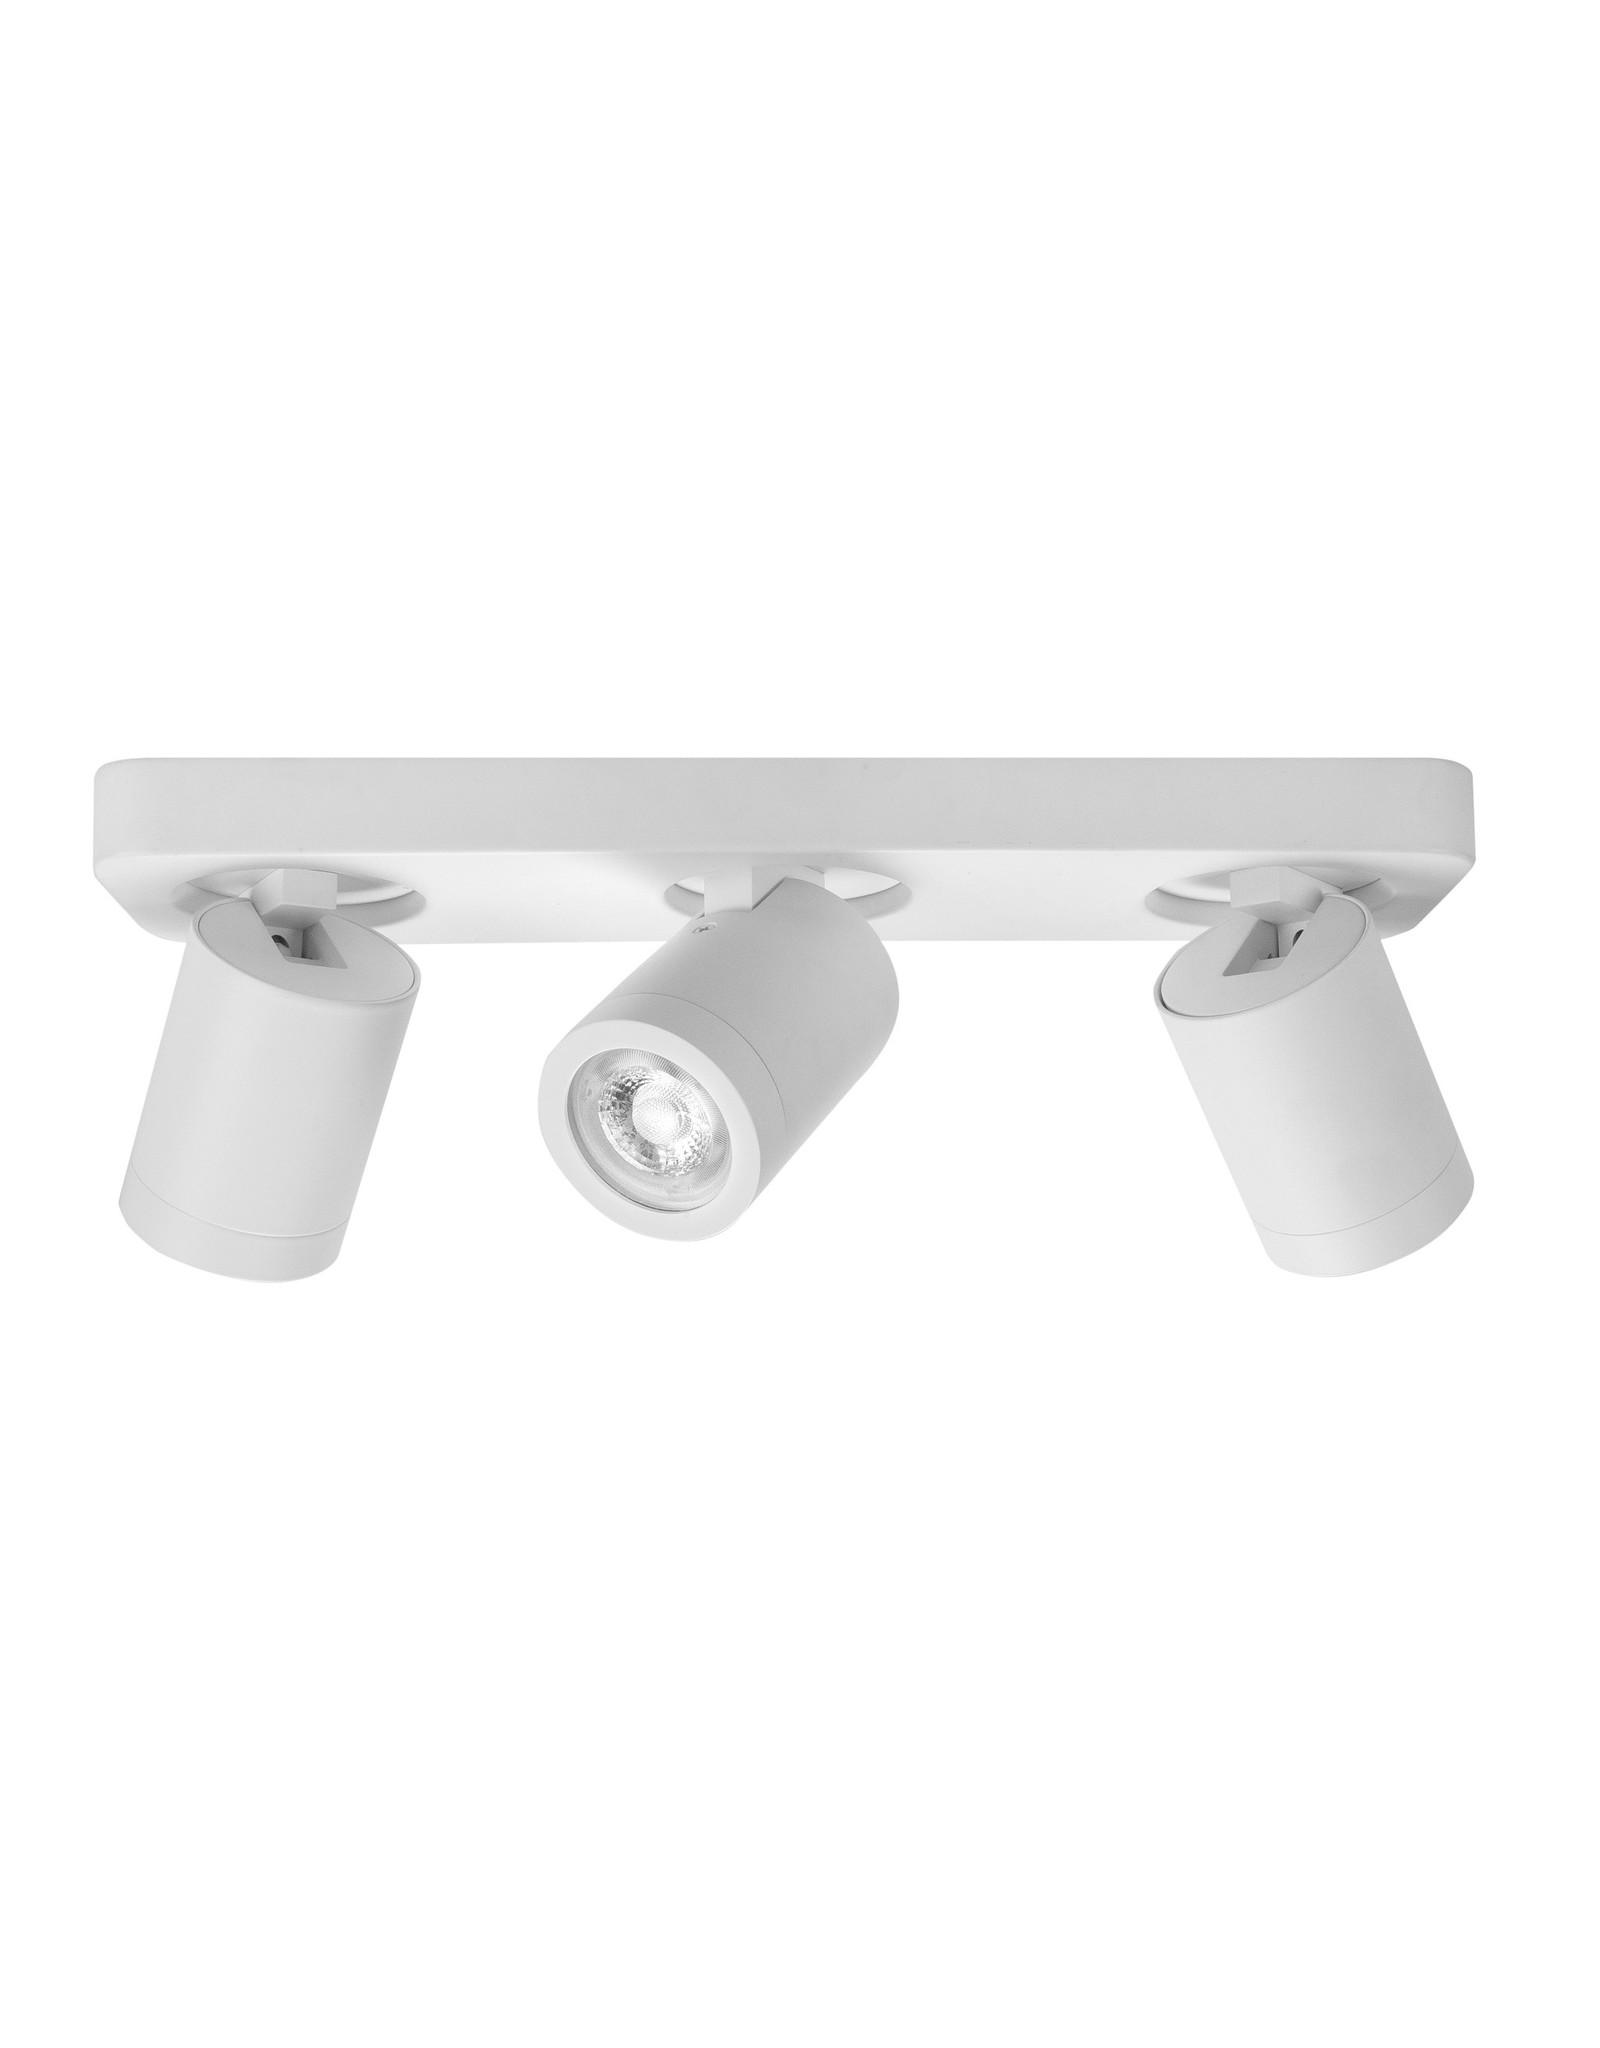 Oliver spot 3 X  GU10 LED IP44 balk Mat Wit zonder lampen